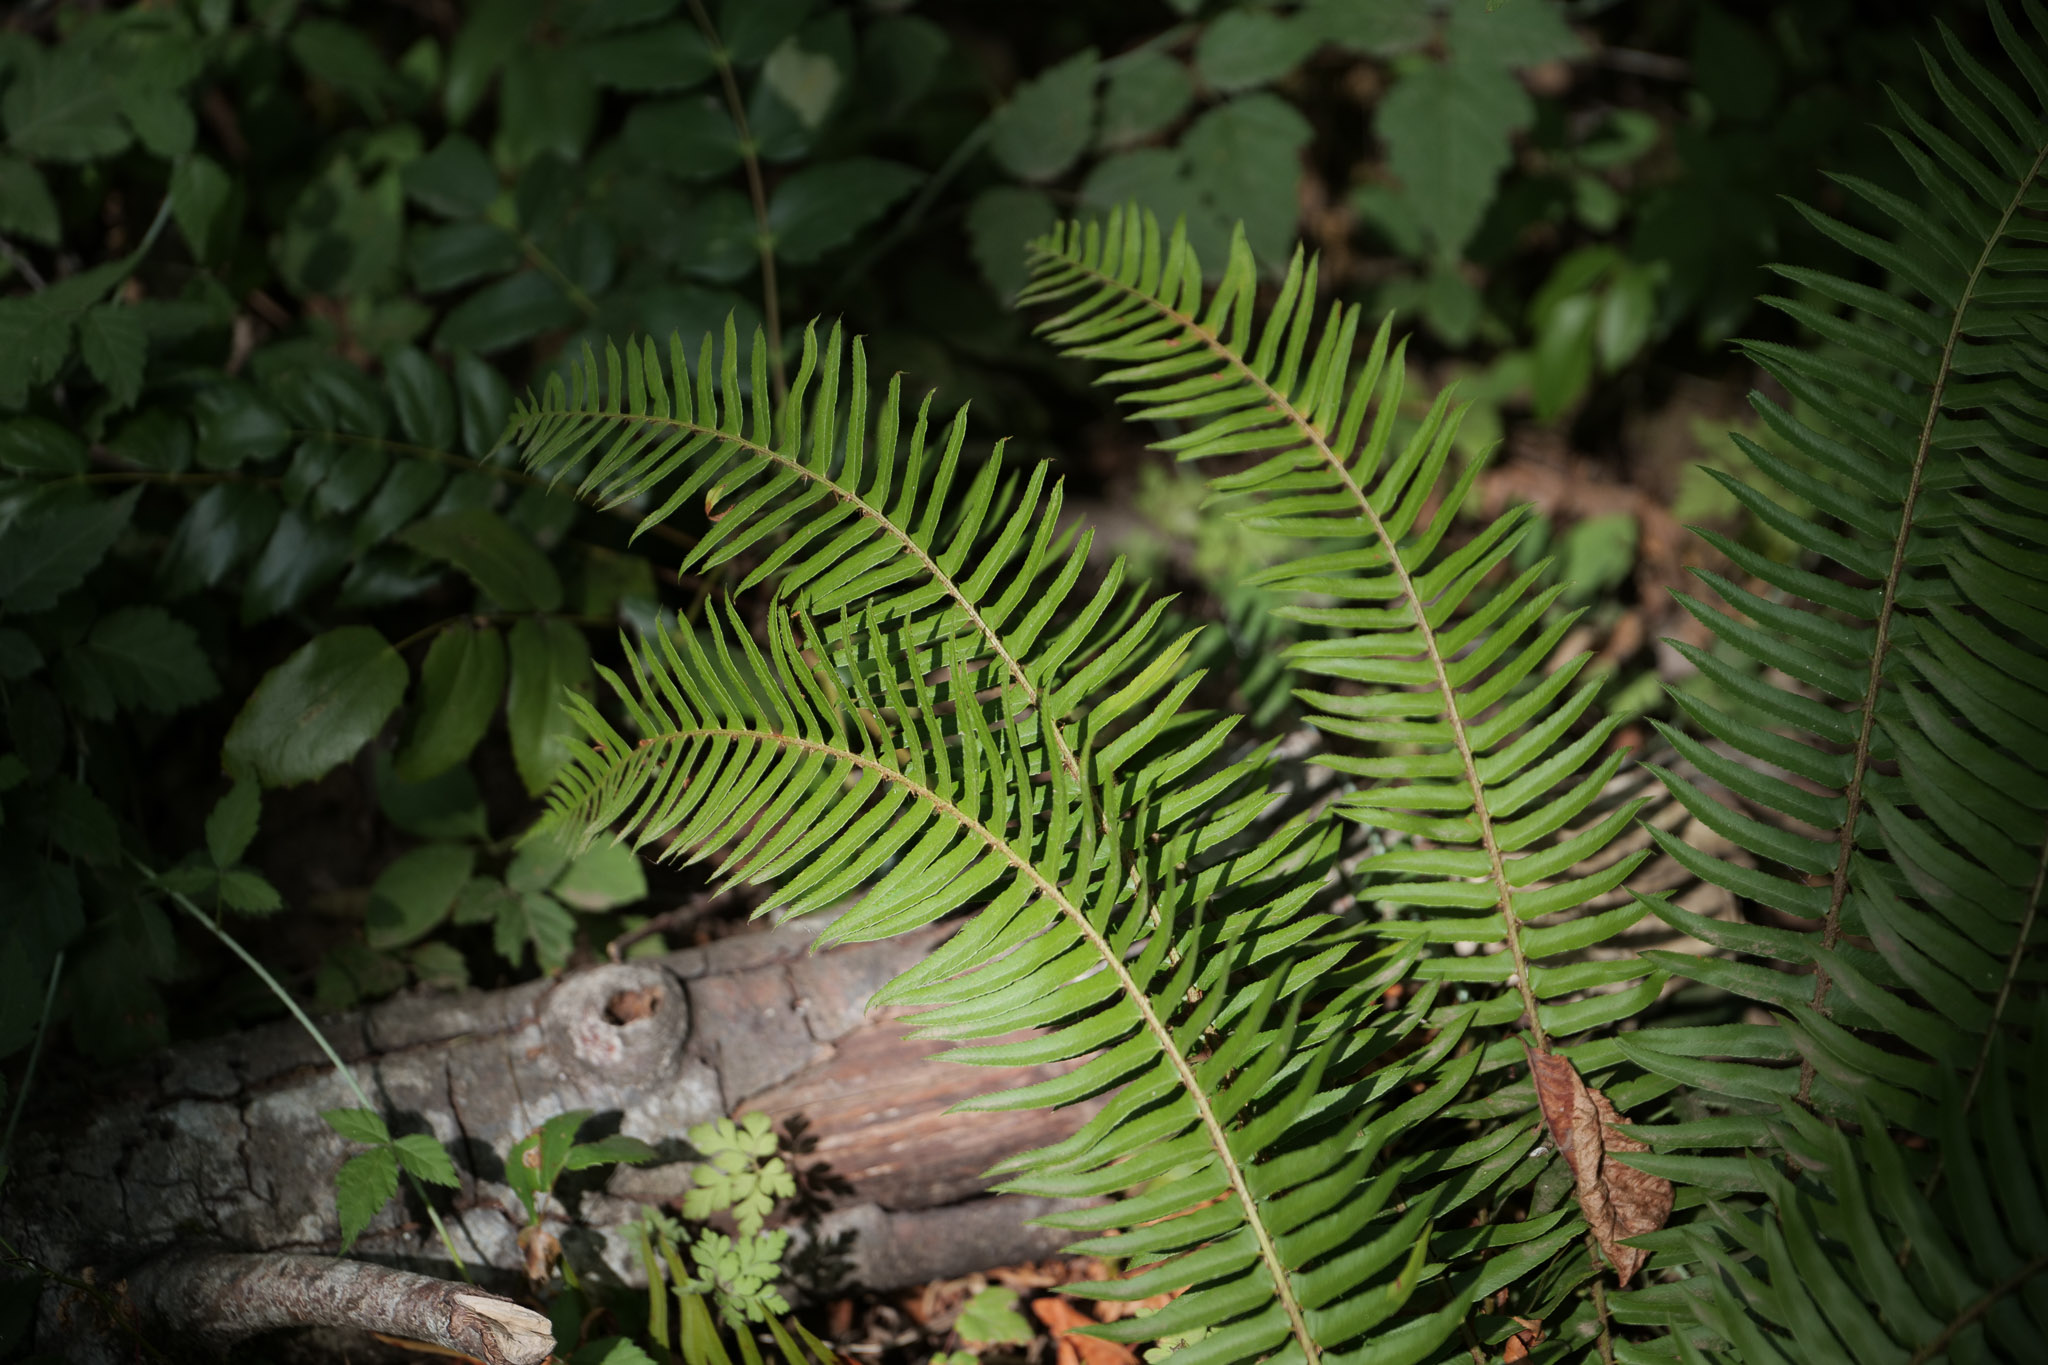 Photo of fern with dramatic lighting shot with Panasonic Lumix S5